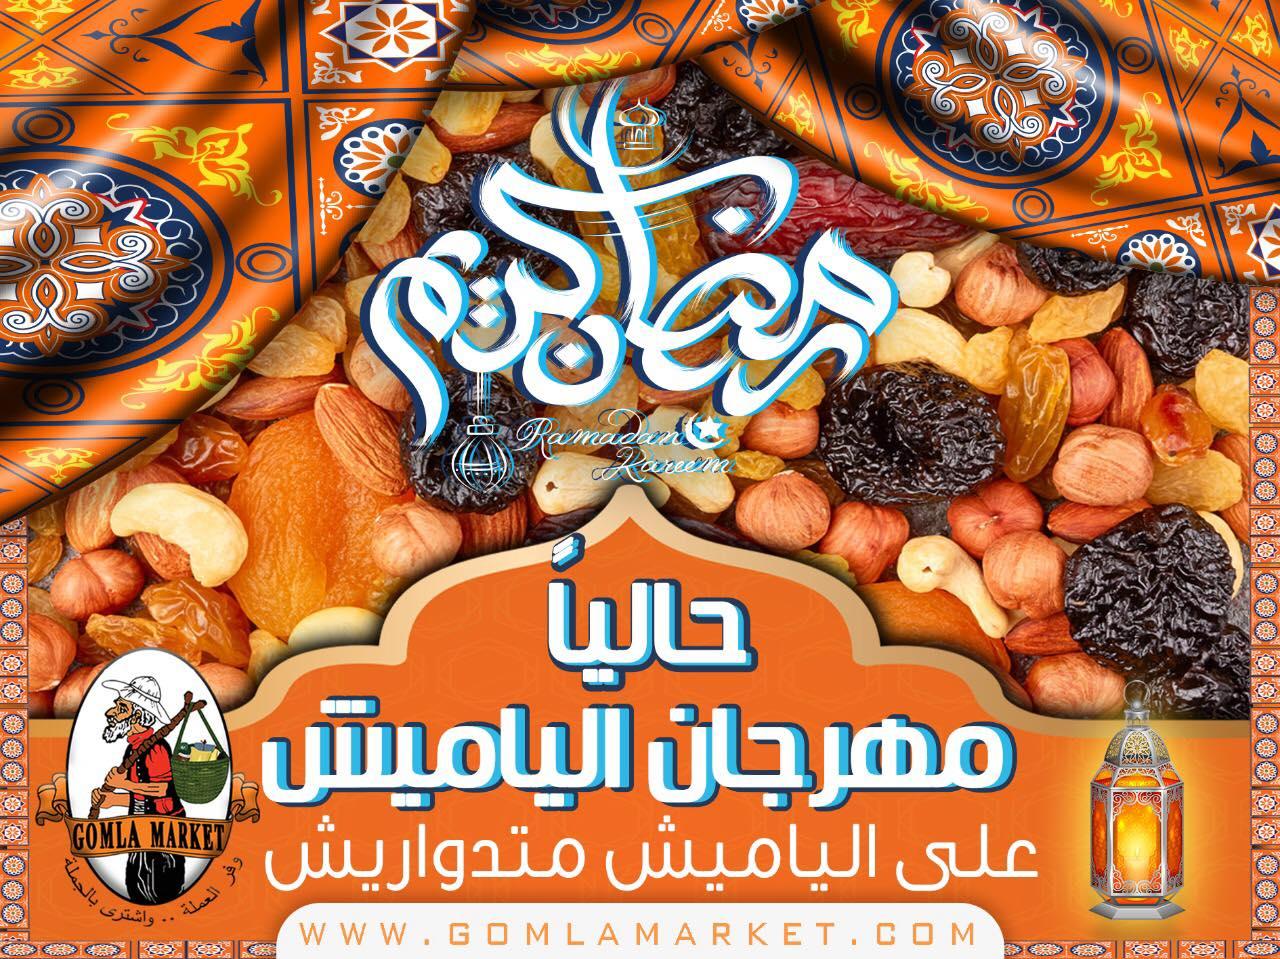 عروض فتح الله رمضان من 11 ابريل حتى 30 ابريل 2020